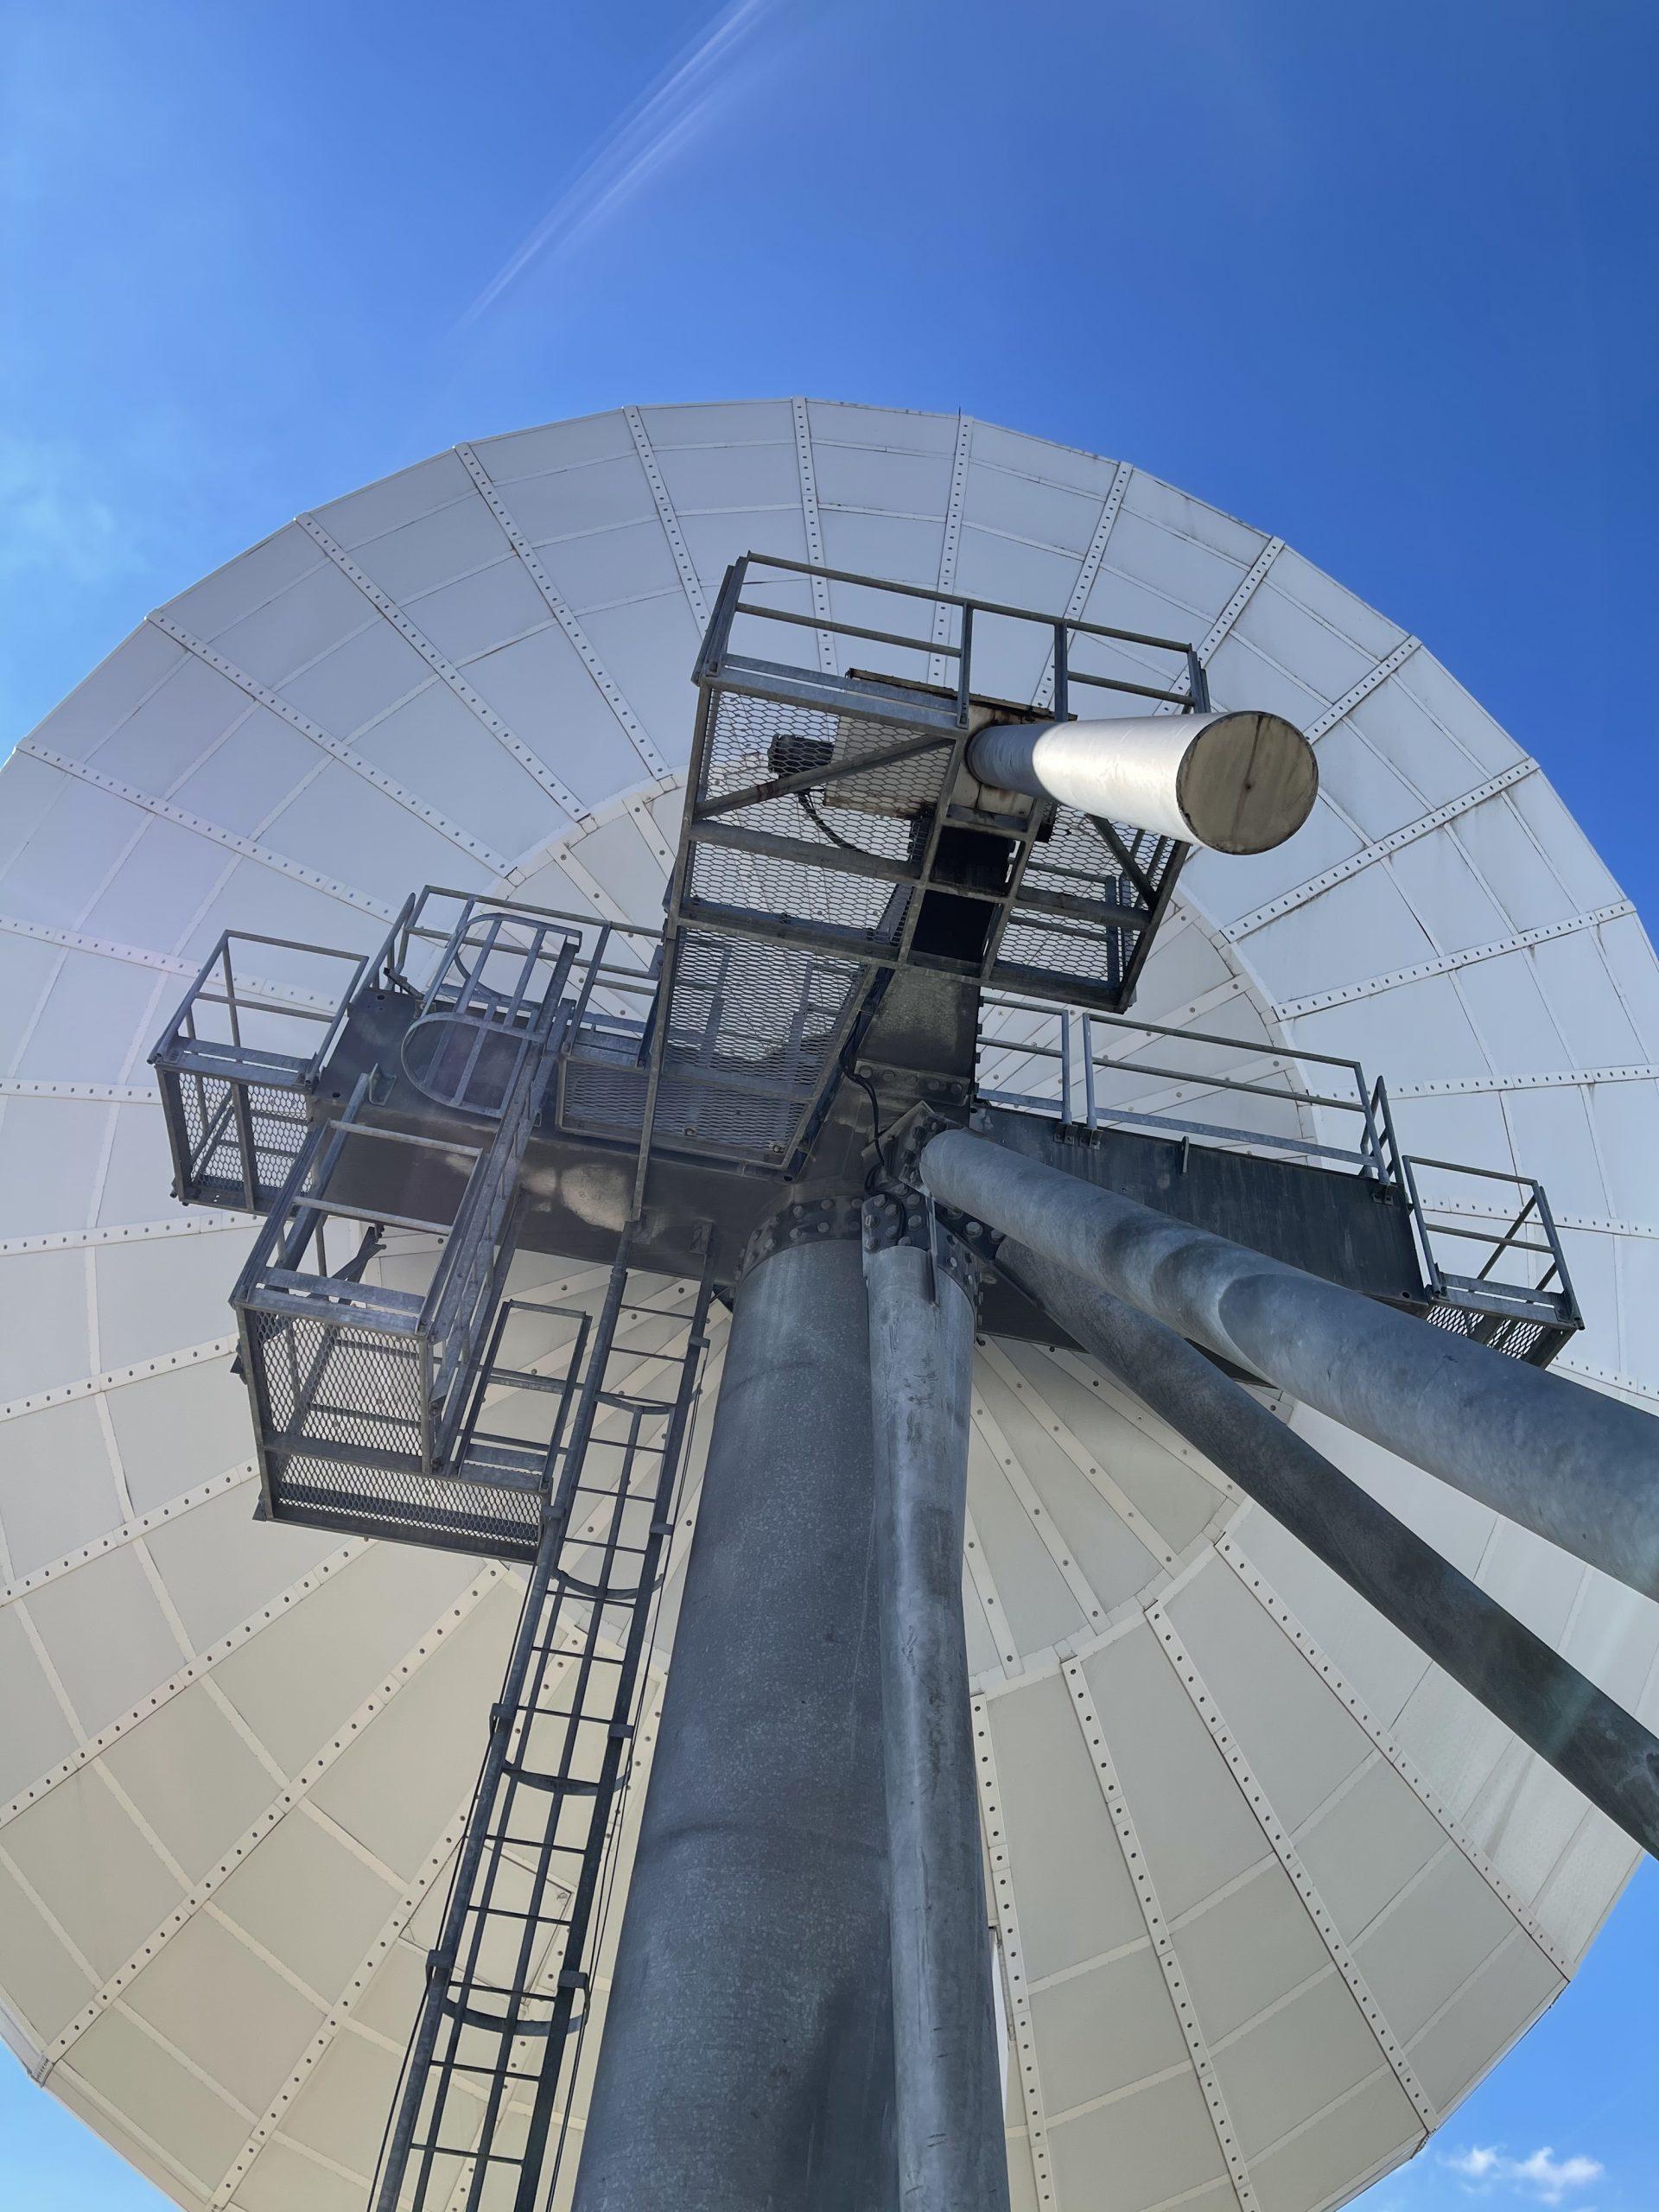 Platform structure of a VertexRSI 18.3m antenna